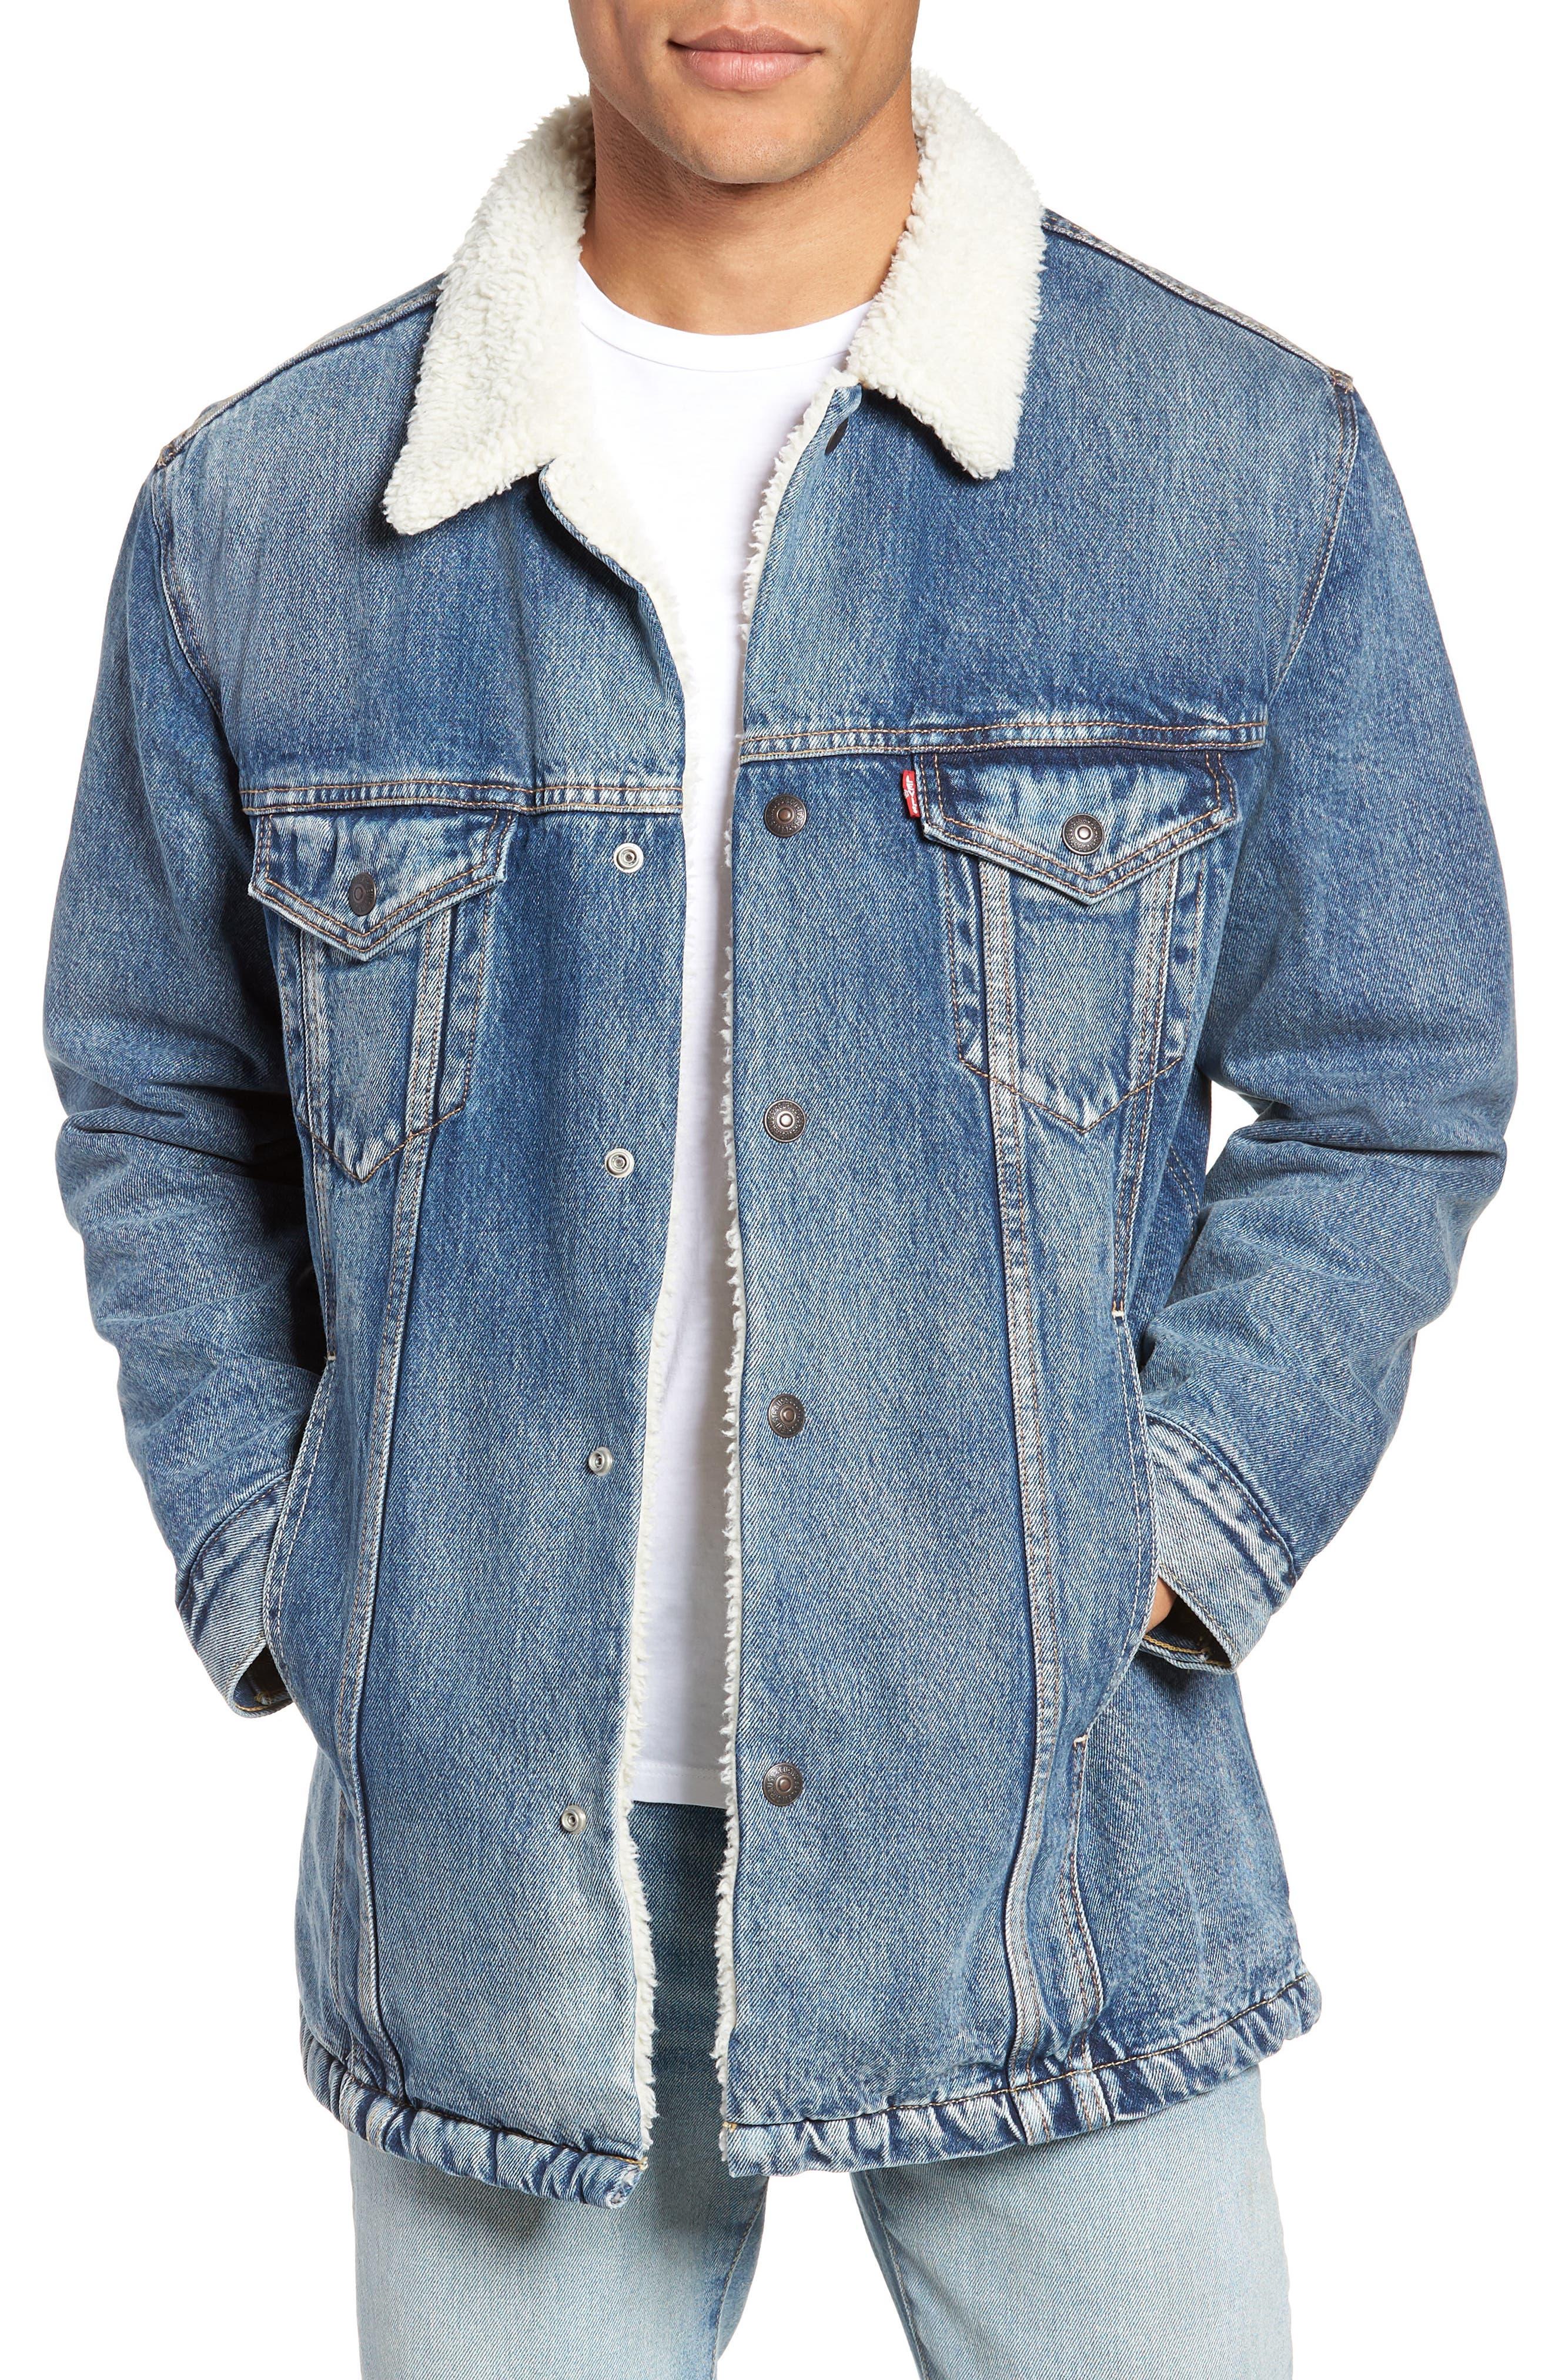 LEVI'S<SUP>®</SUP>, Long Faux Fur Lined Trucker Jacket, Main thumbnail 1, color, 420